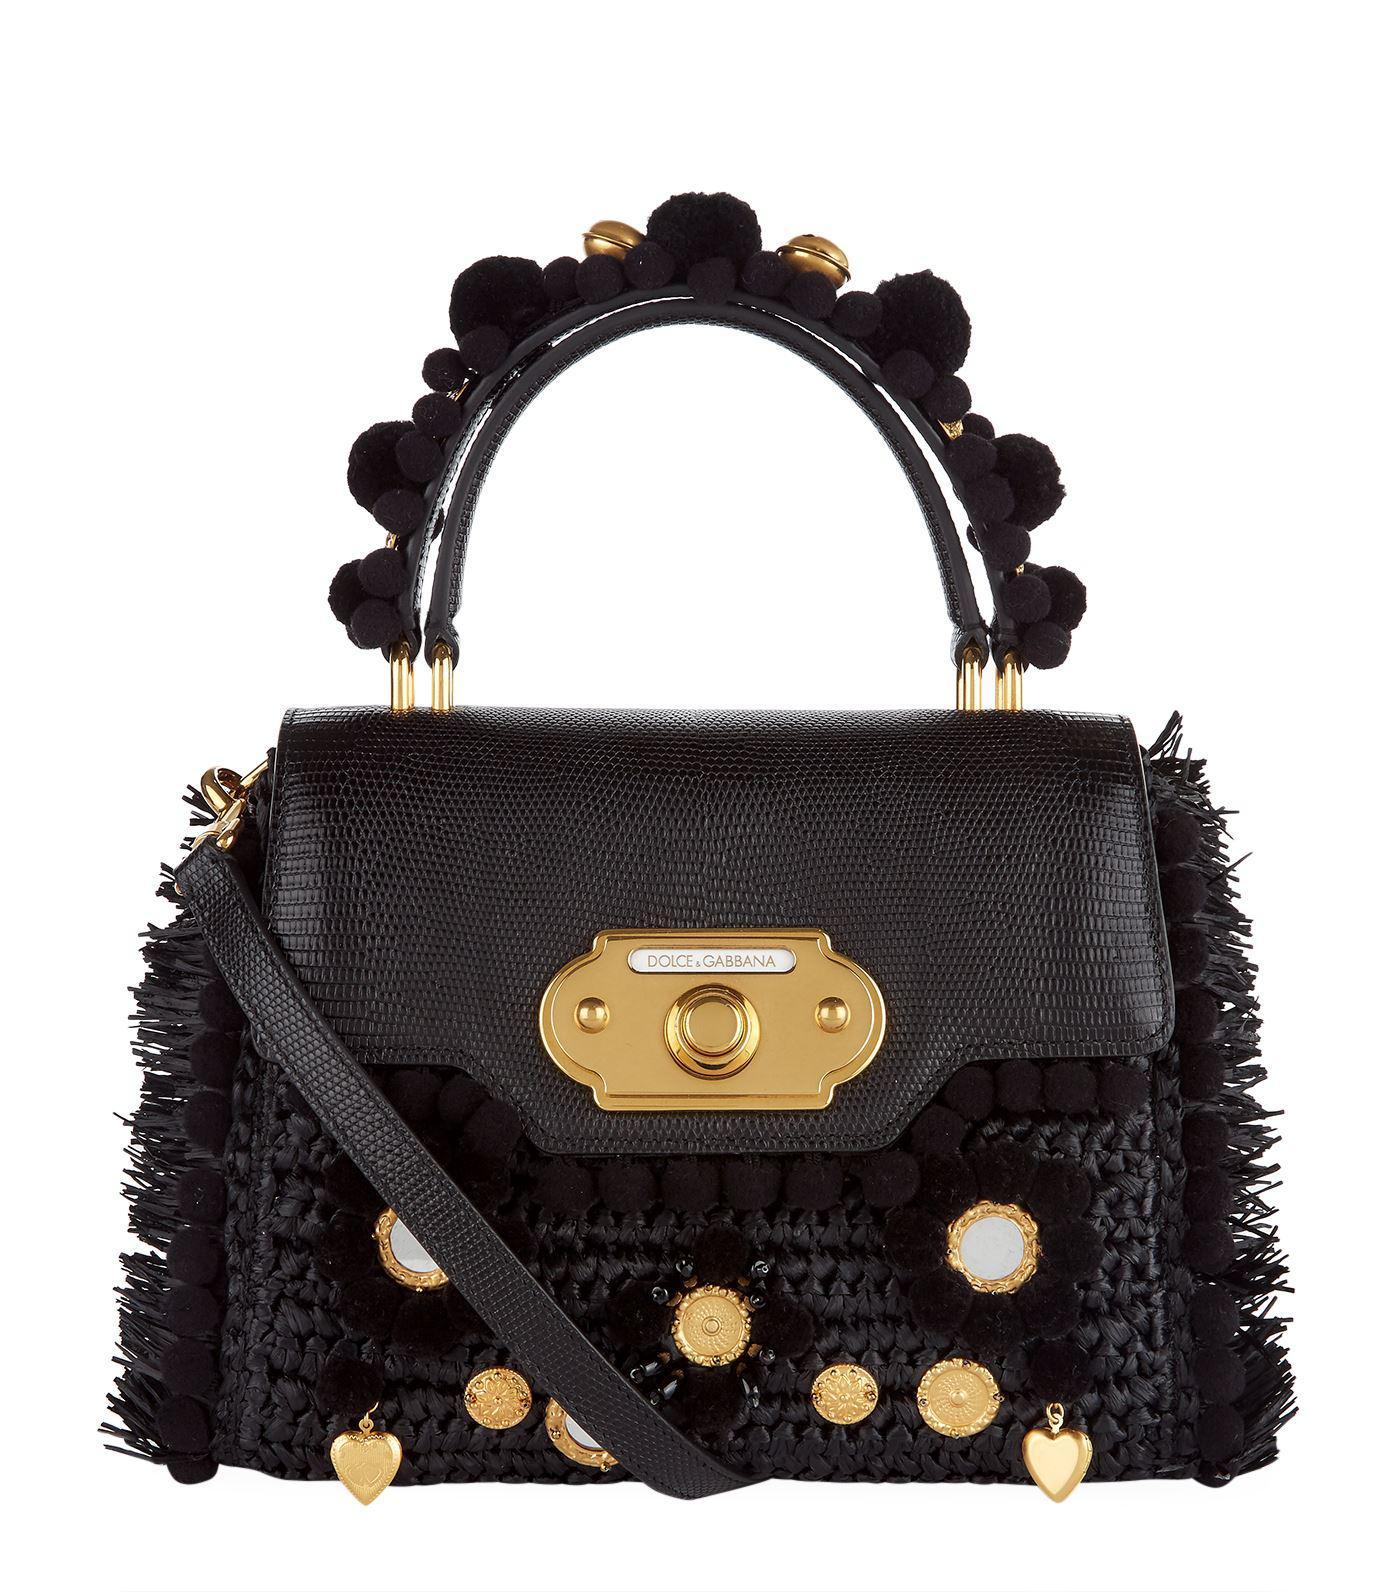 Lyst - Dolce   Gabbana Raffia Top Handle Bag in Black bb6bce2ed8b